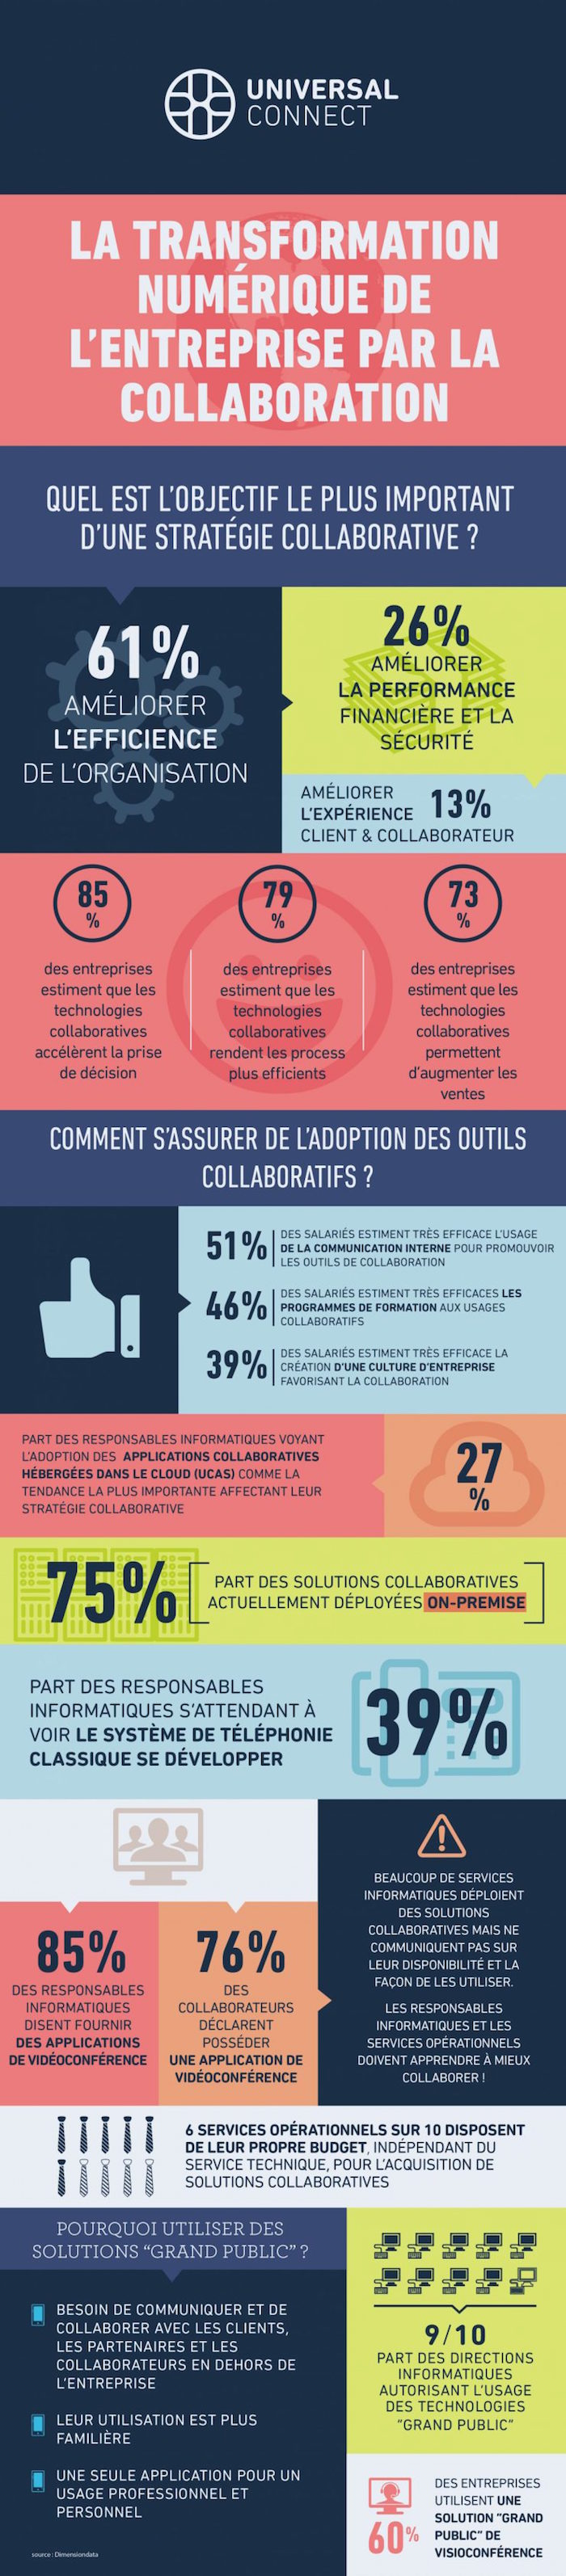 infographie-collaboration-collaborative